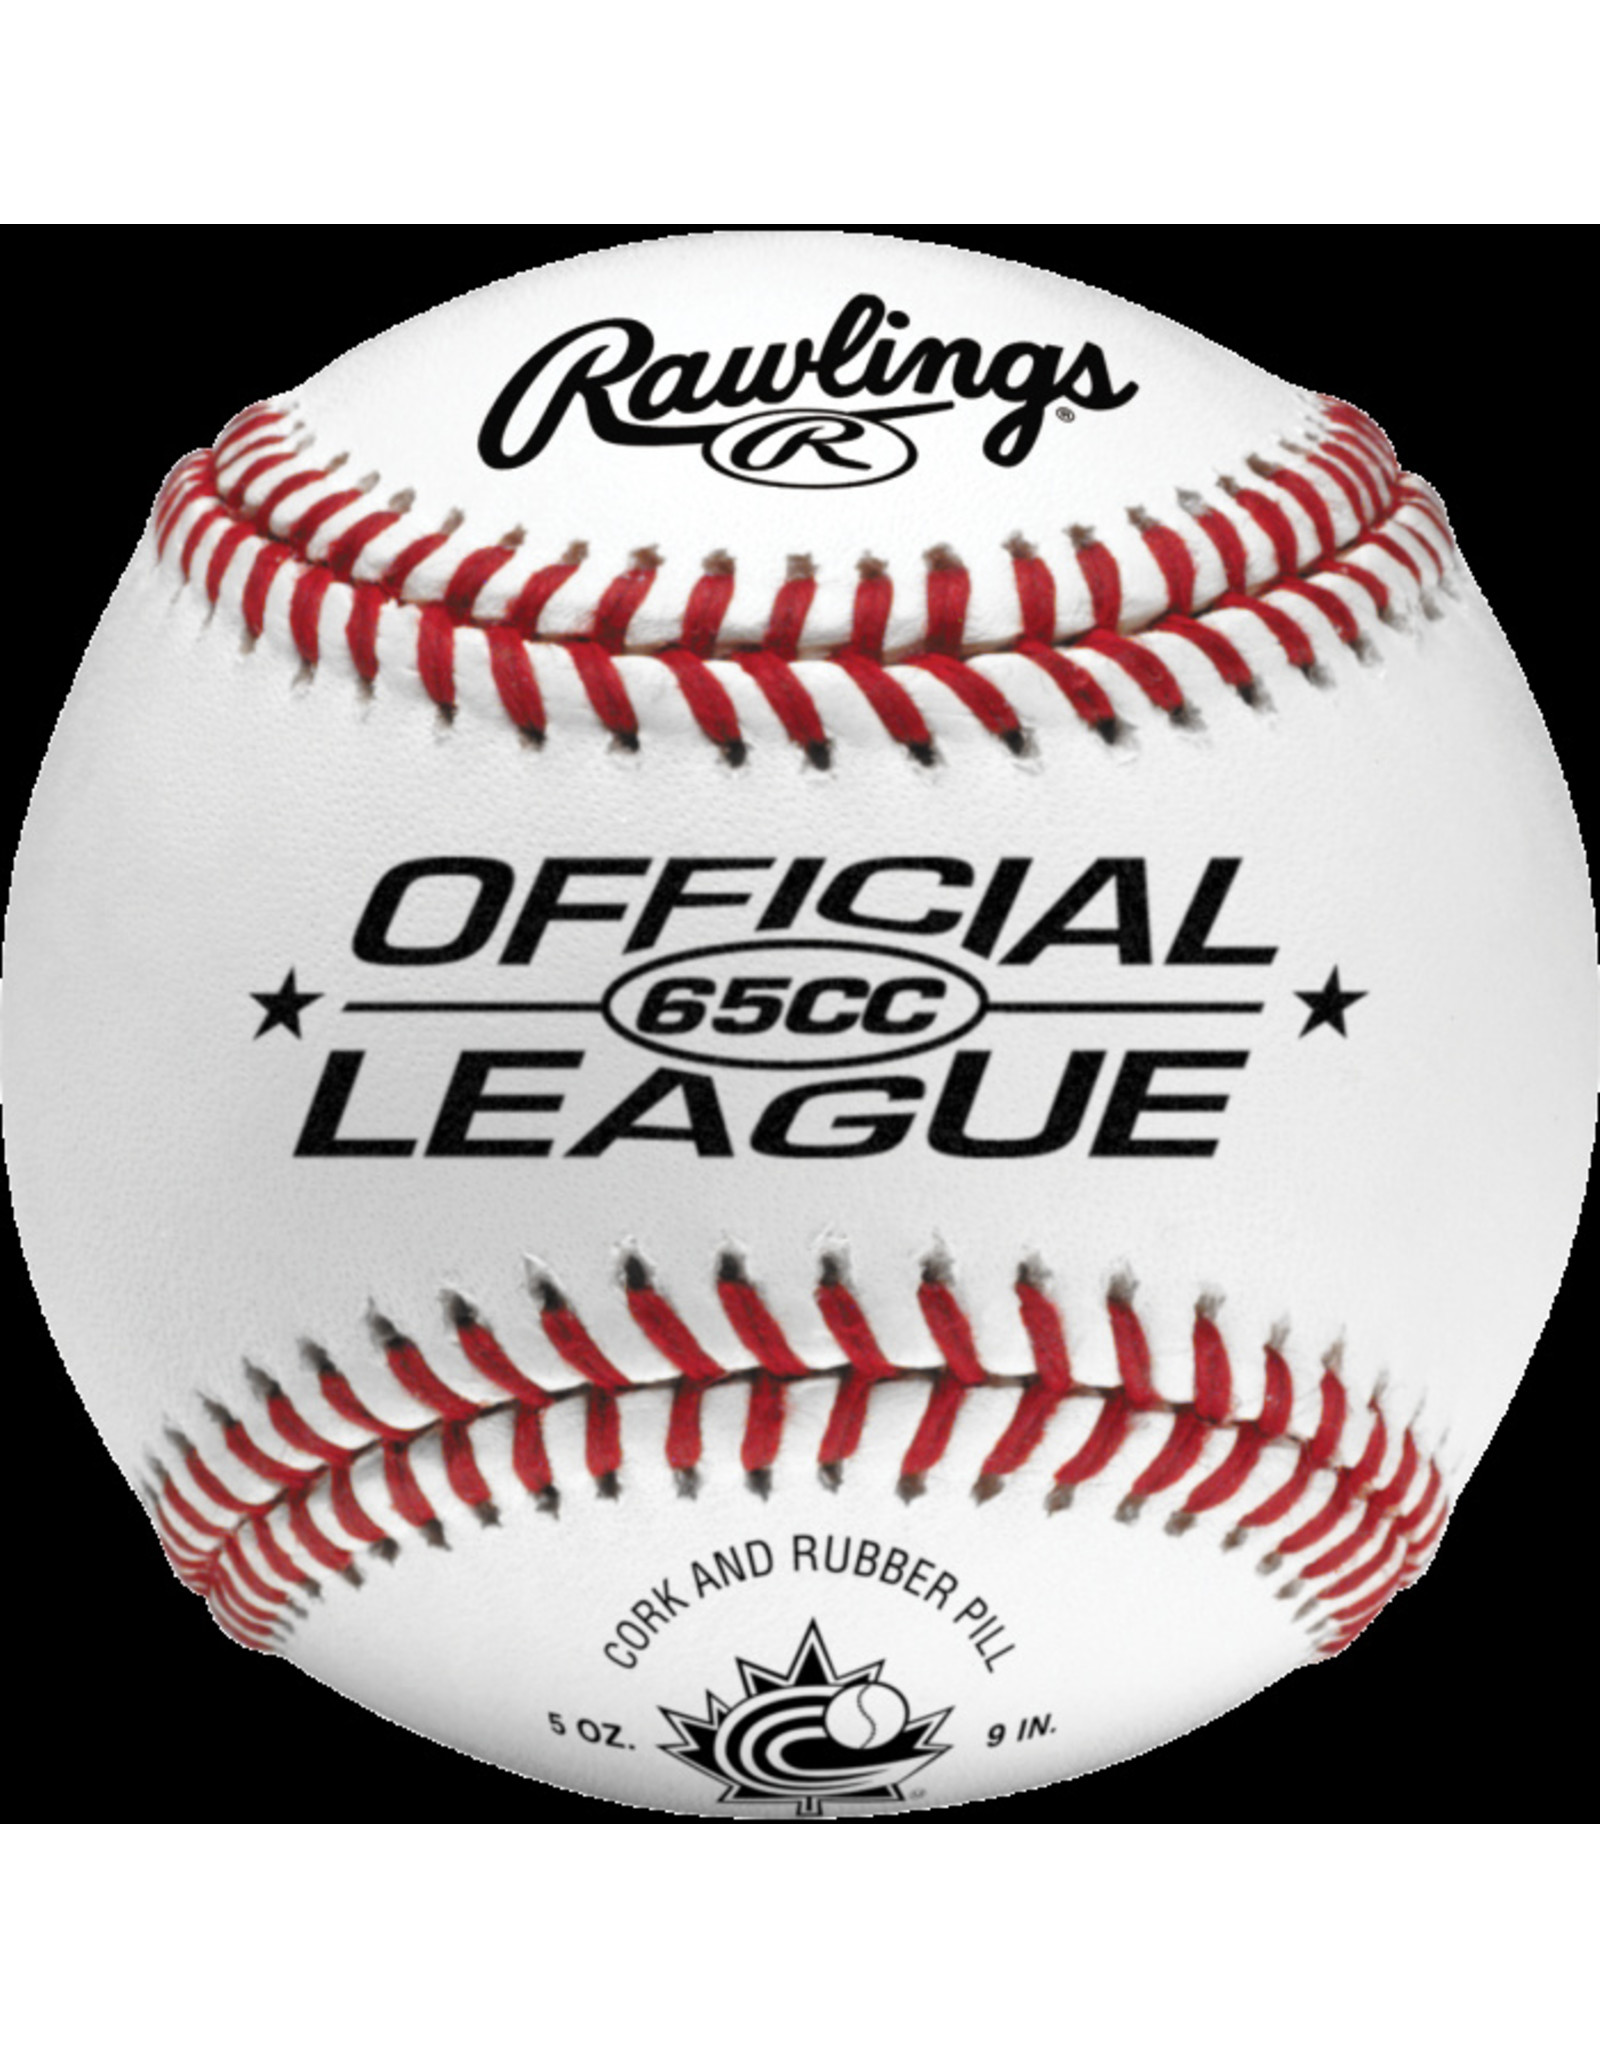 Rawlings - 12 Balles 9'' 65CC